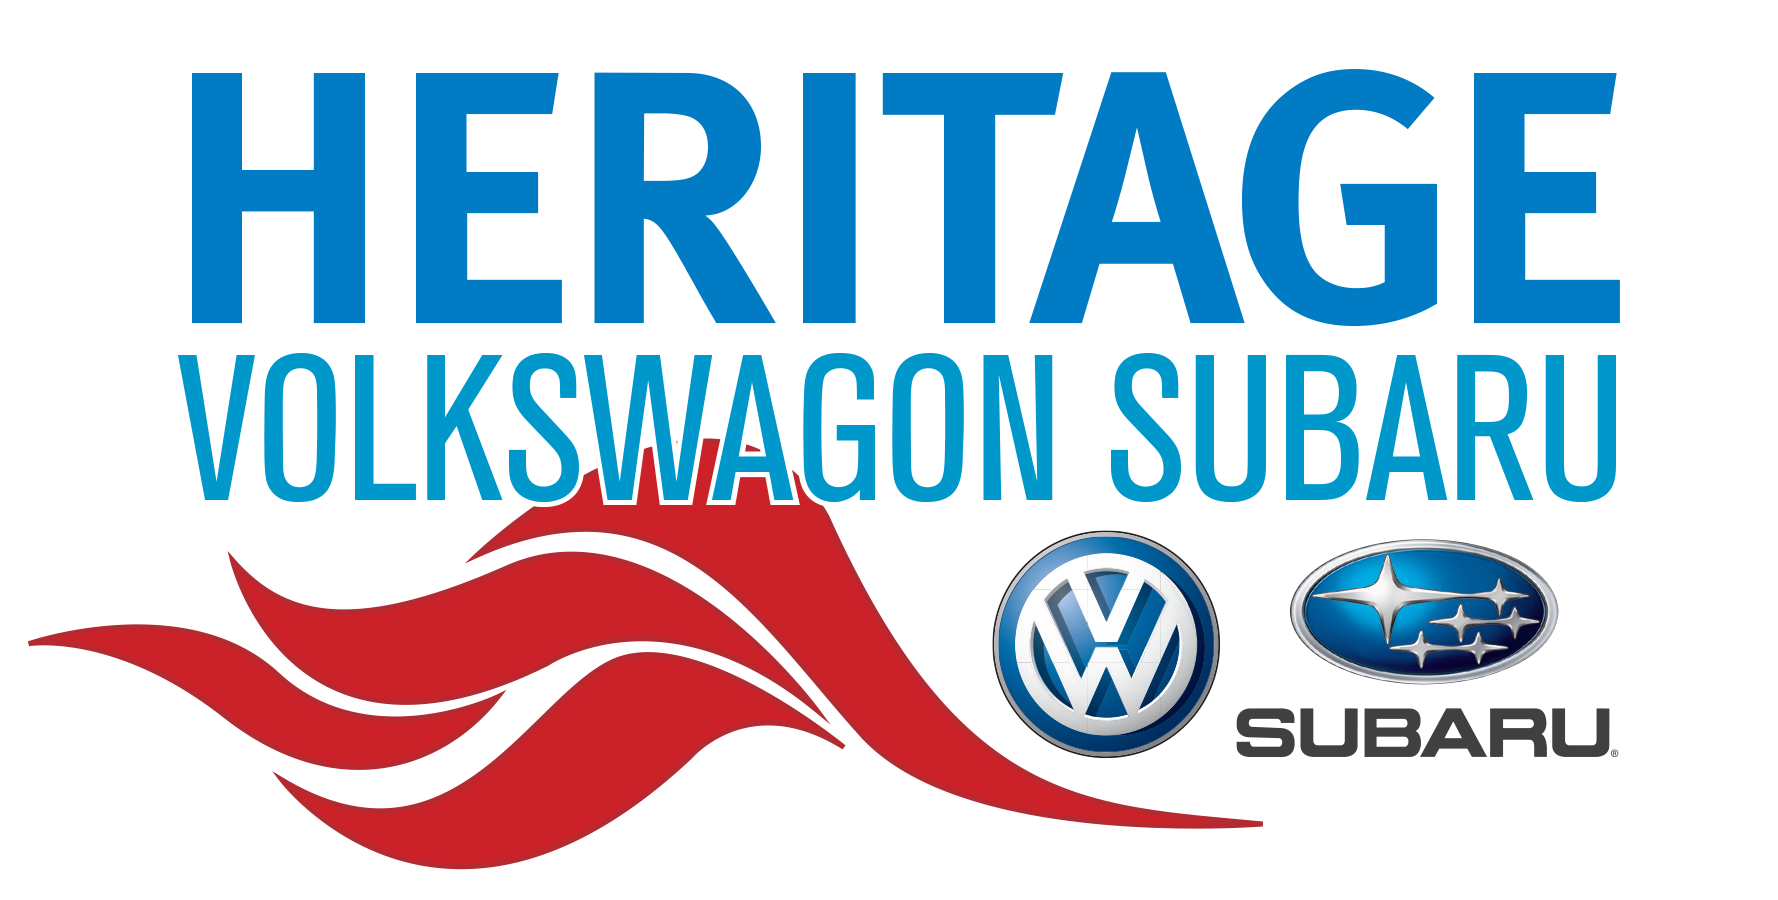 VW_Subaru_Logos_2.png